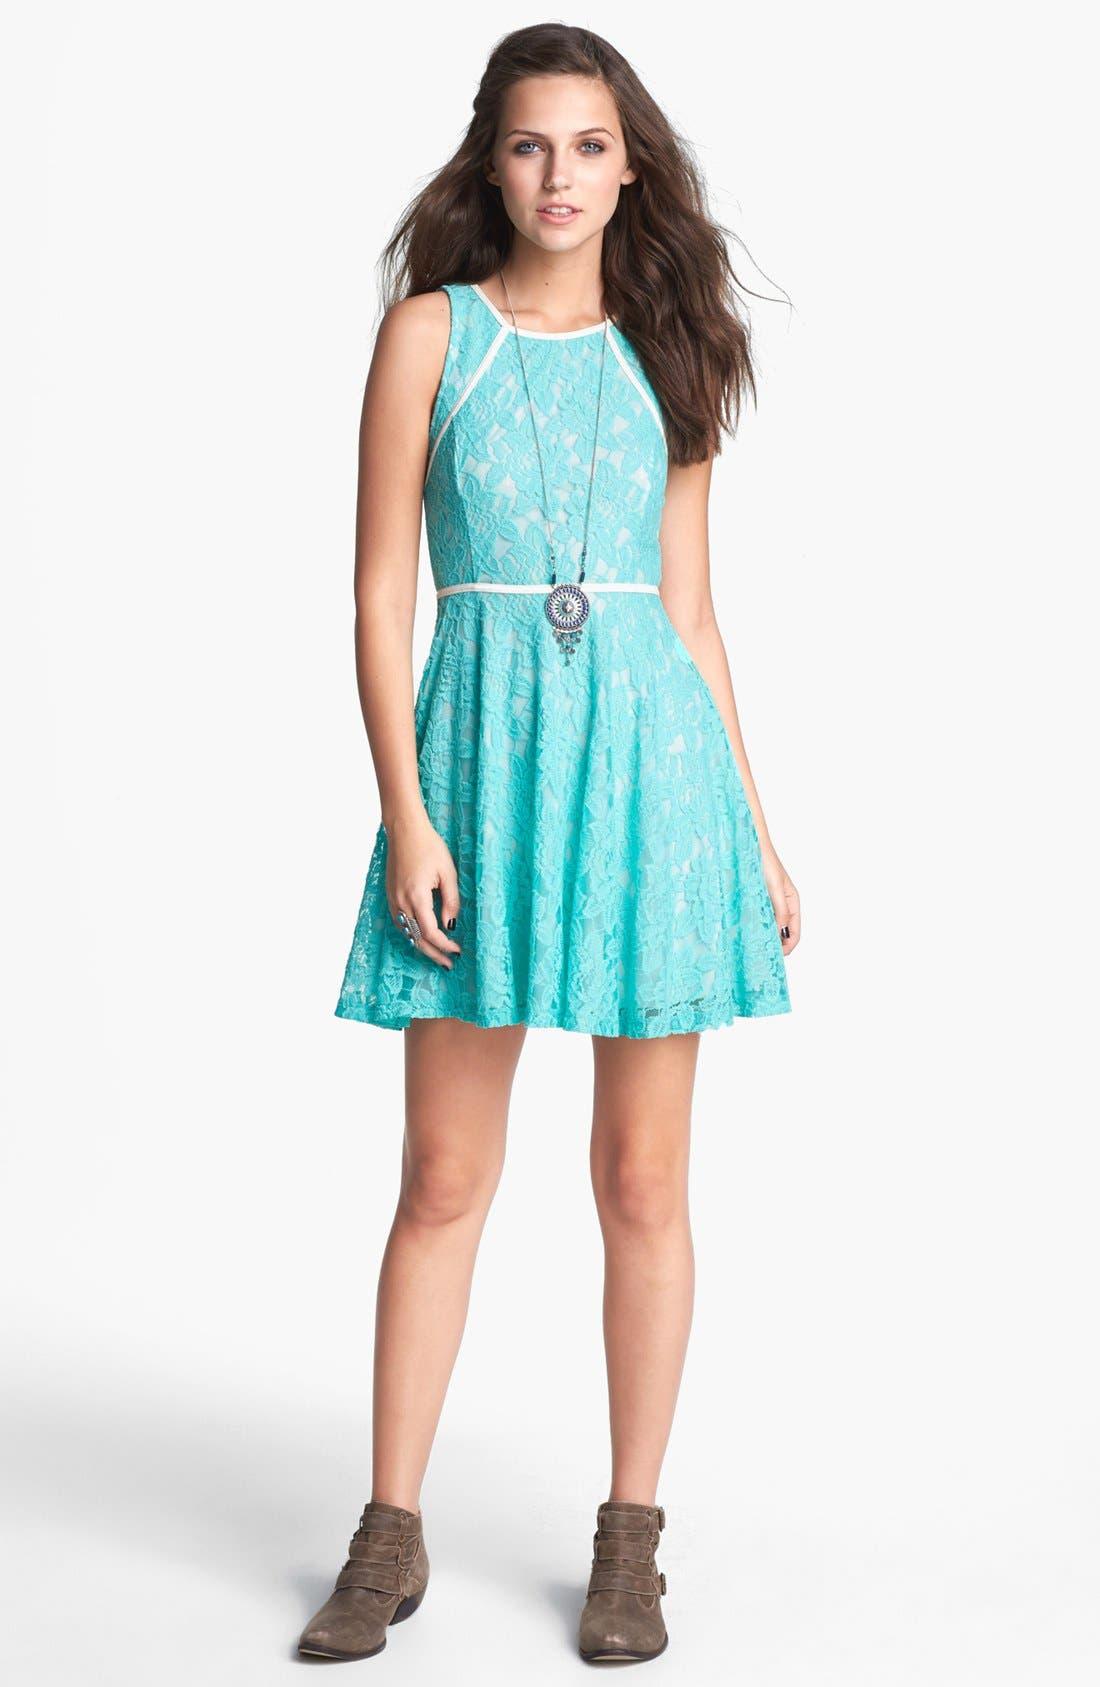 Alternate Image 1 Selected - Lush Faux Leather Trim Lace Skater Dress (Juniors)